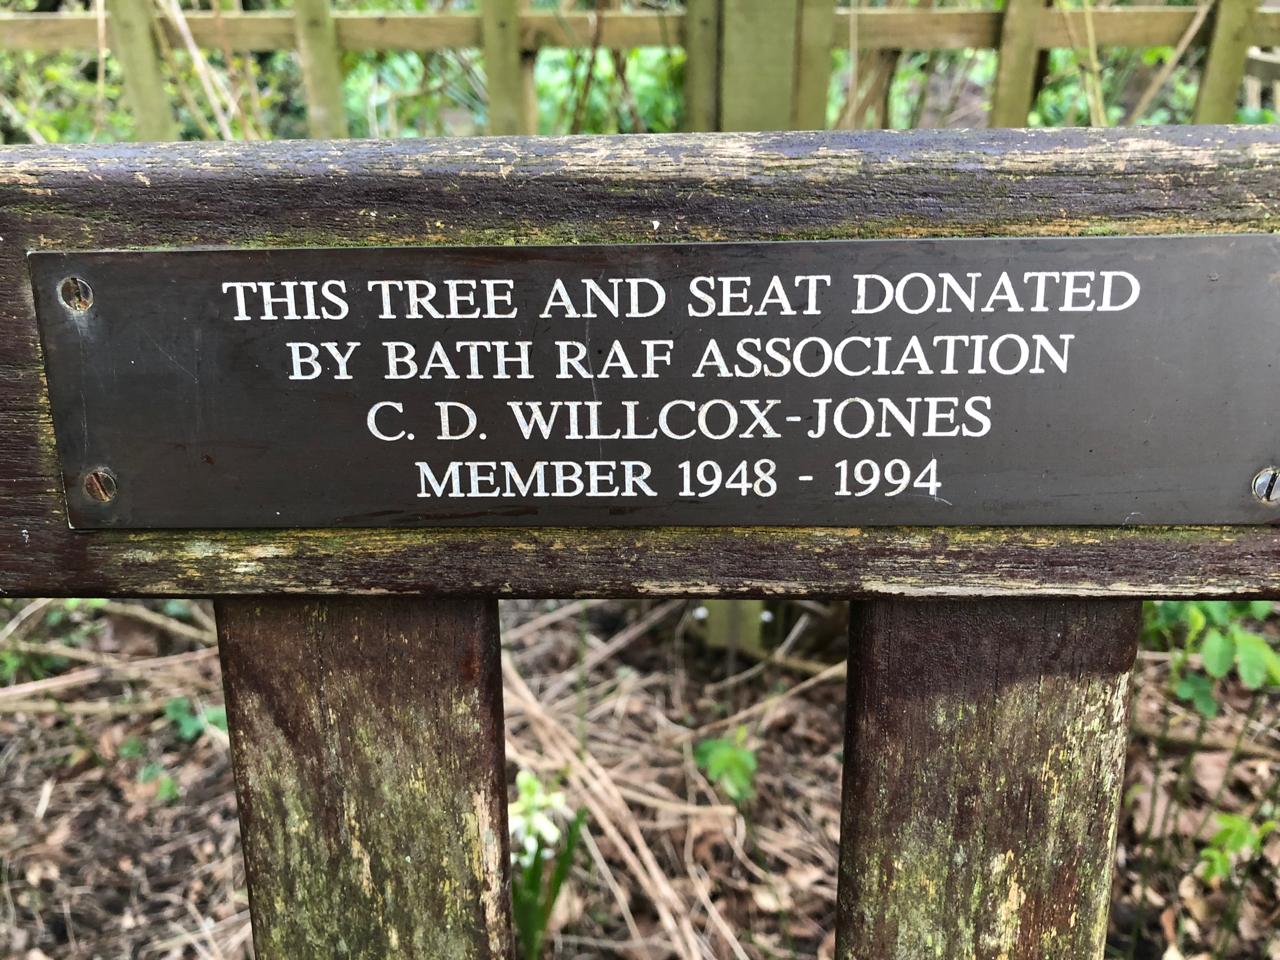 Willcox-Jones, Bath RAF Association